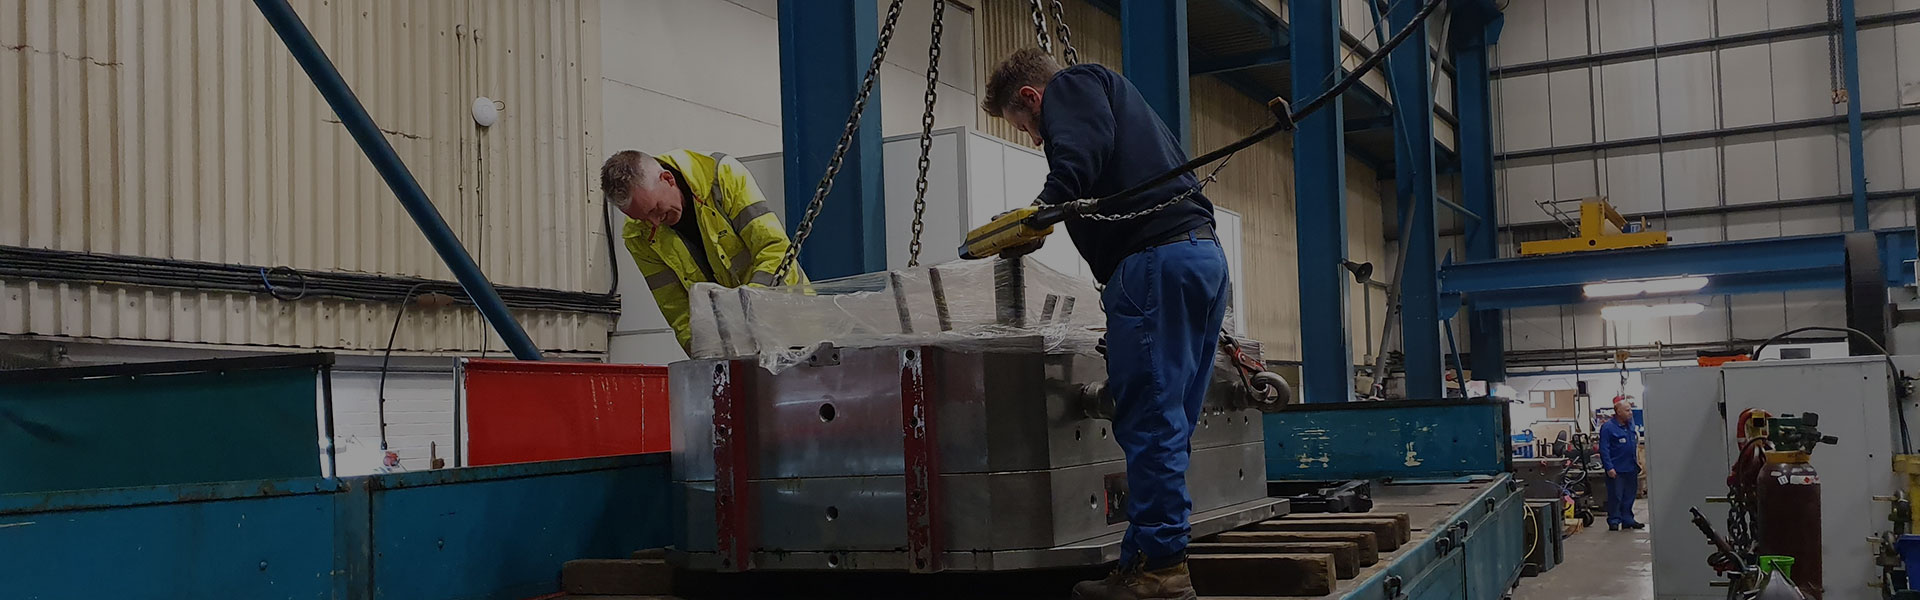 Tooling Modification & Repair upto 15 tonnes